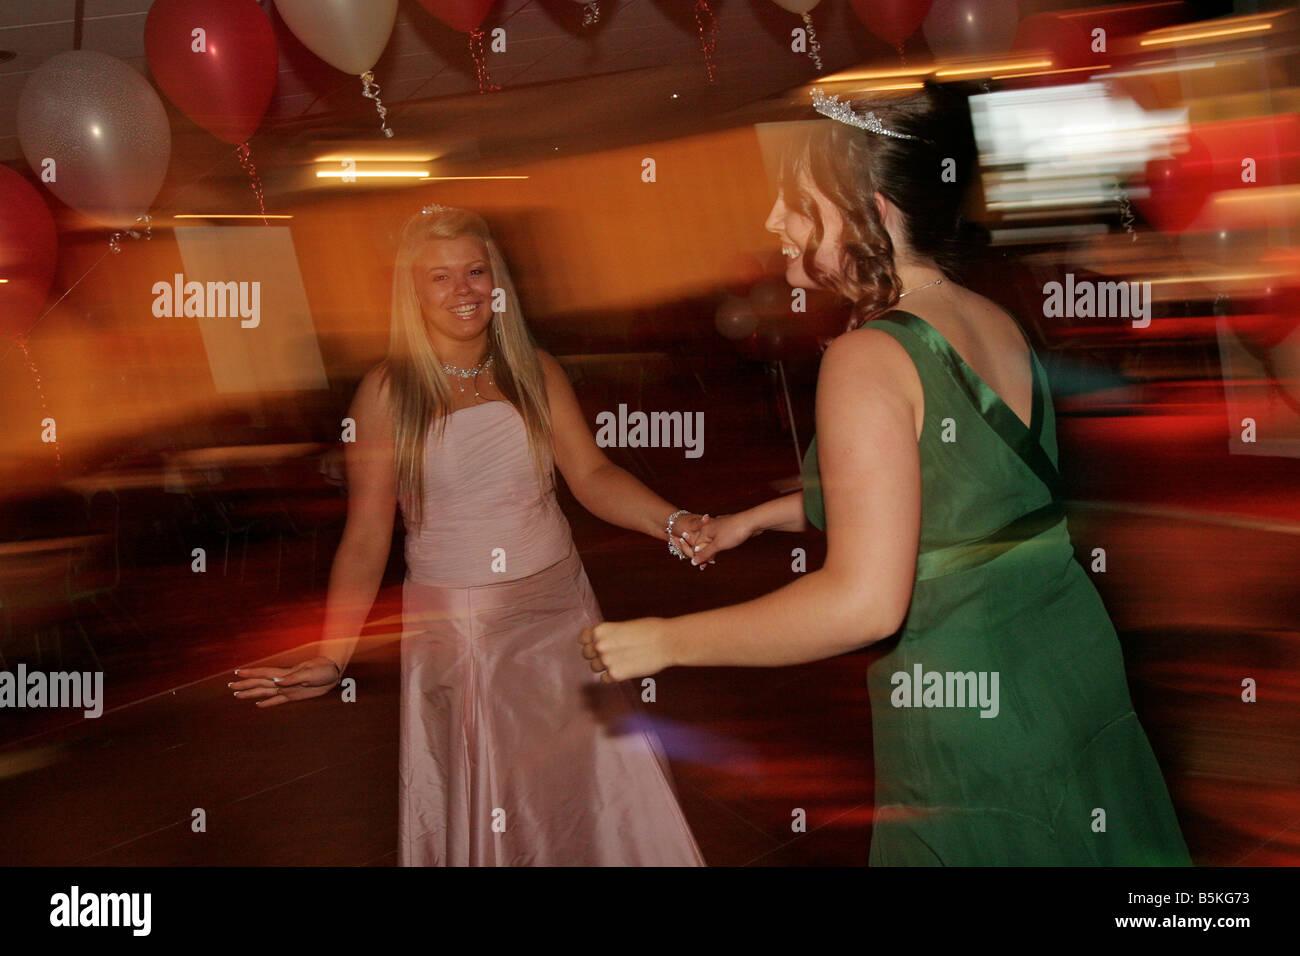 Teenage girls dancing at their High School Prom at Southampton Football Club, England - Stock Image